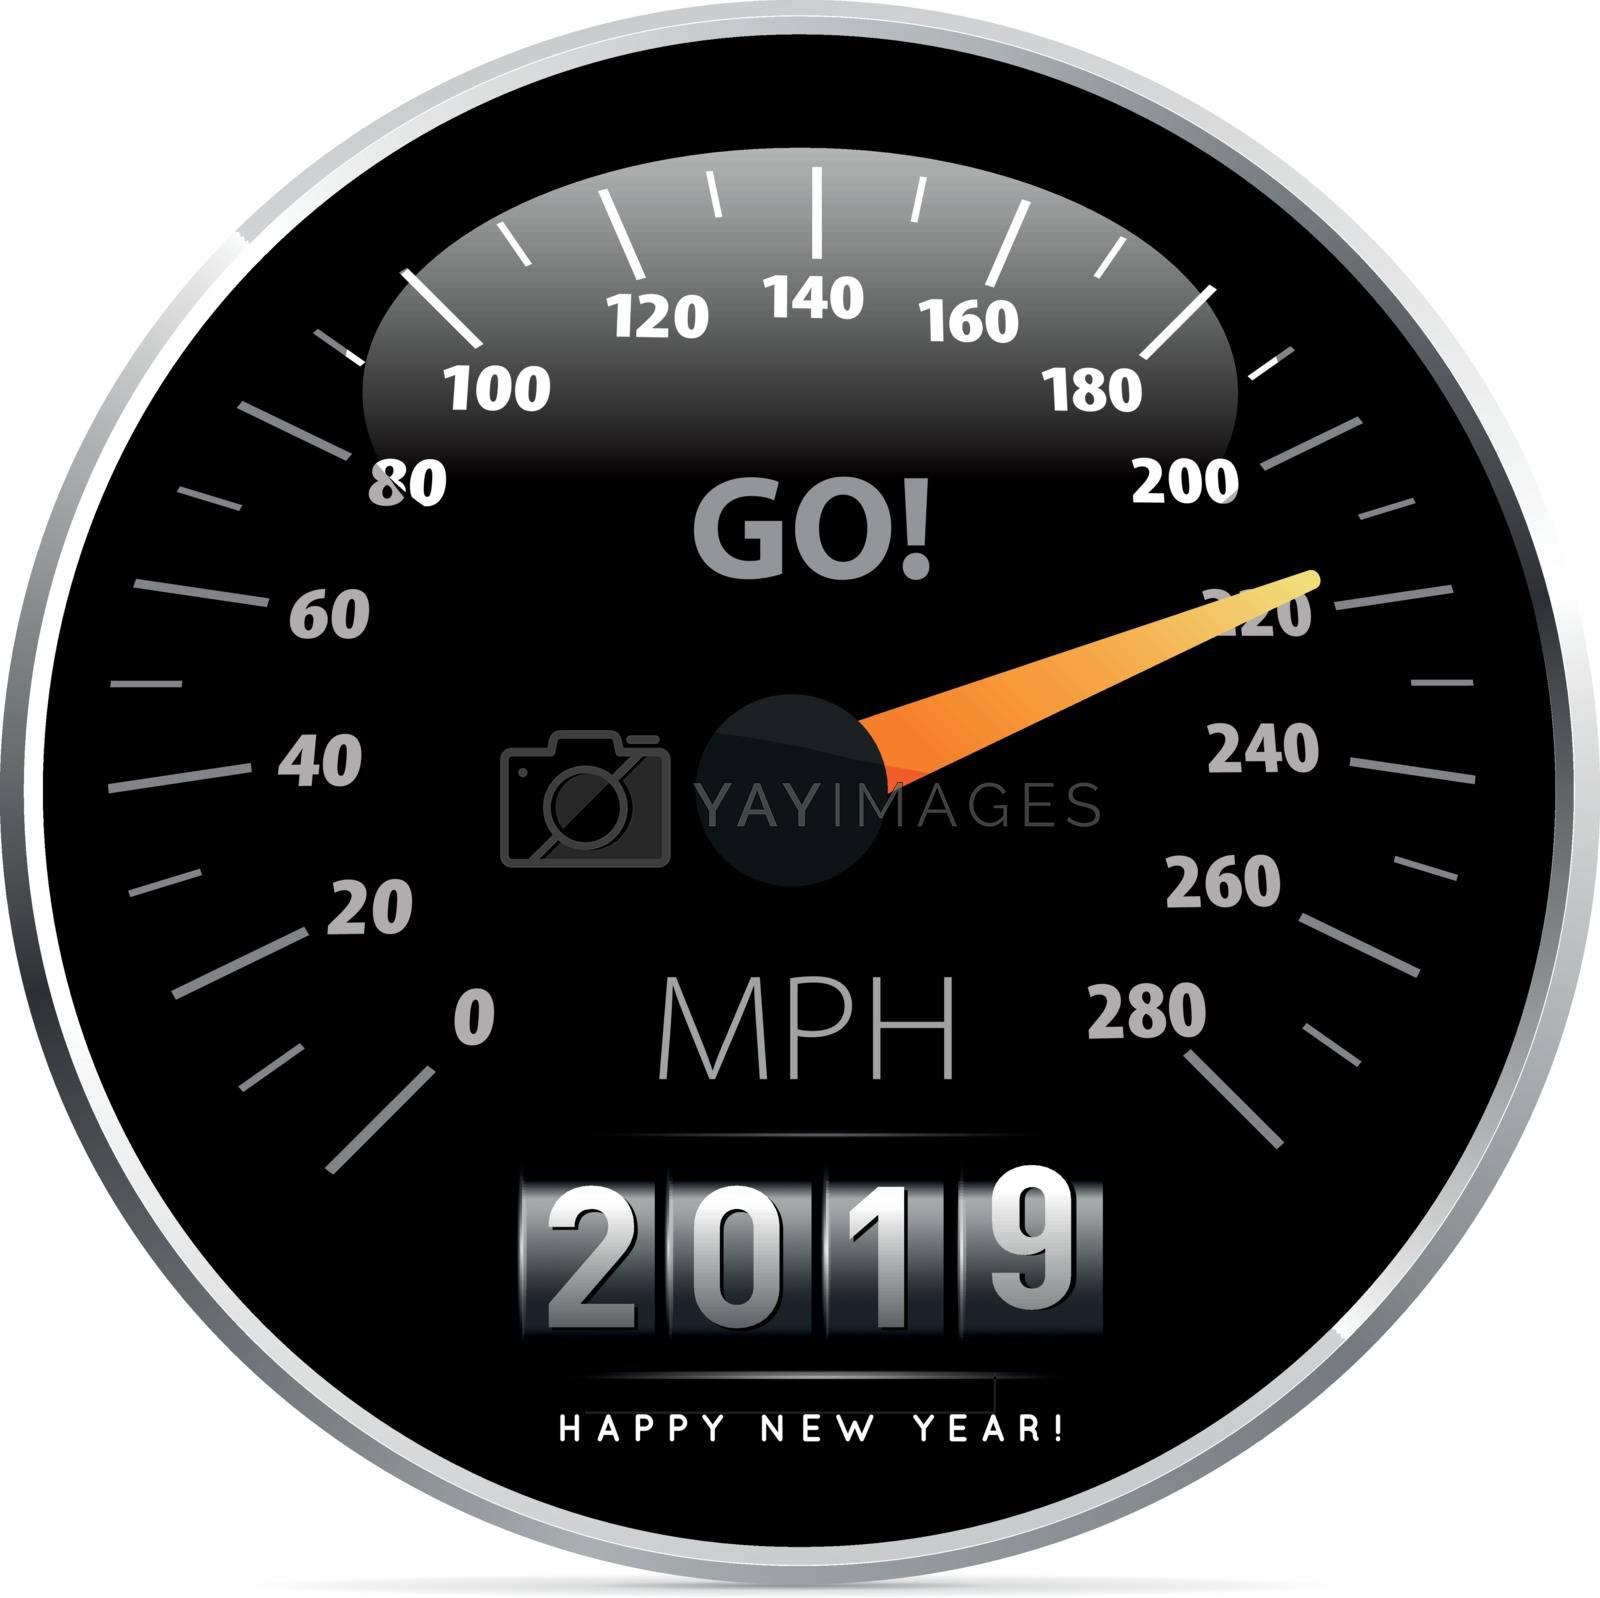 2019 year Calendar speedometer car. Vector illustration